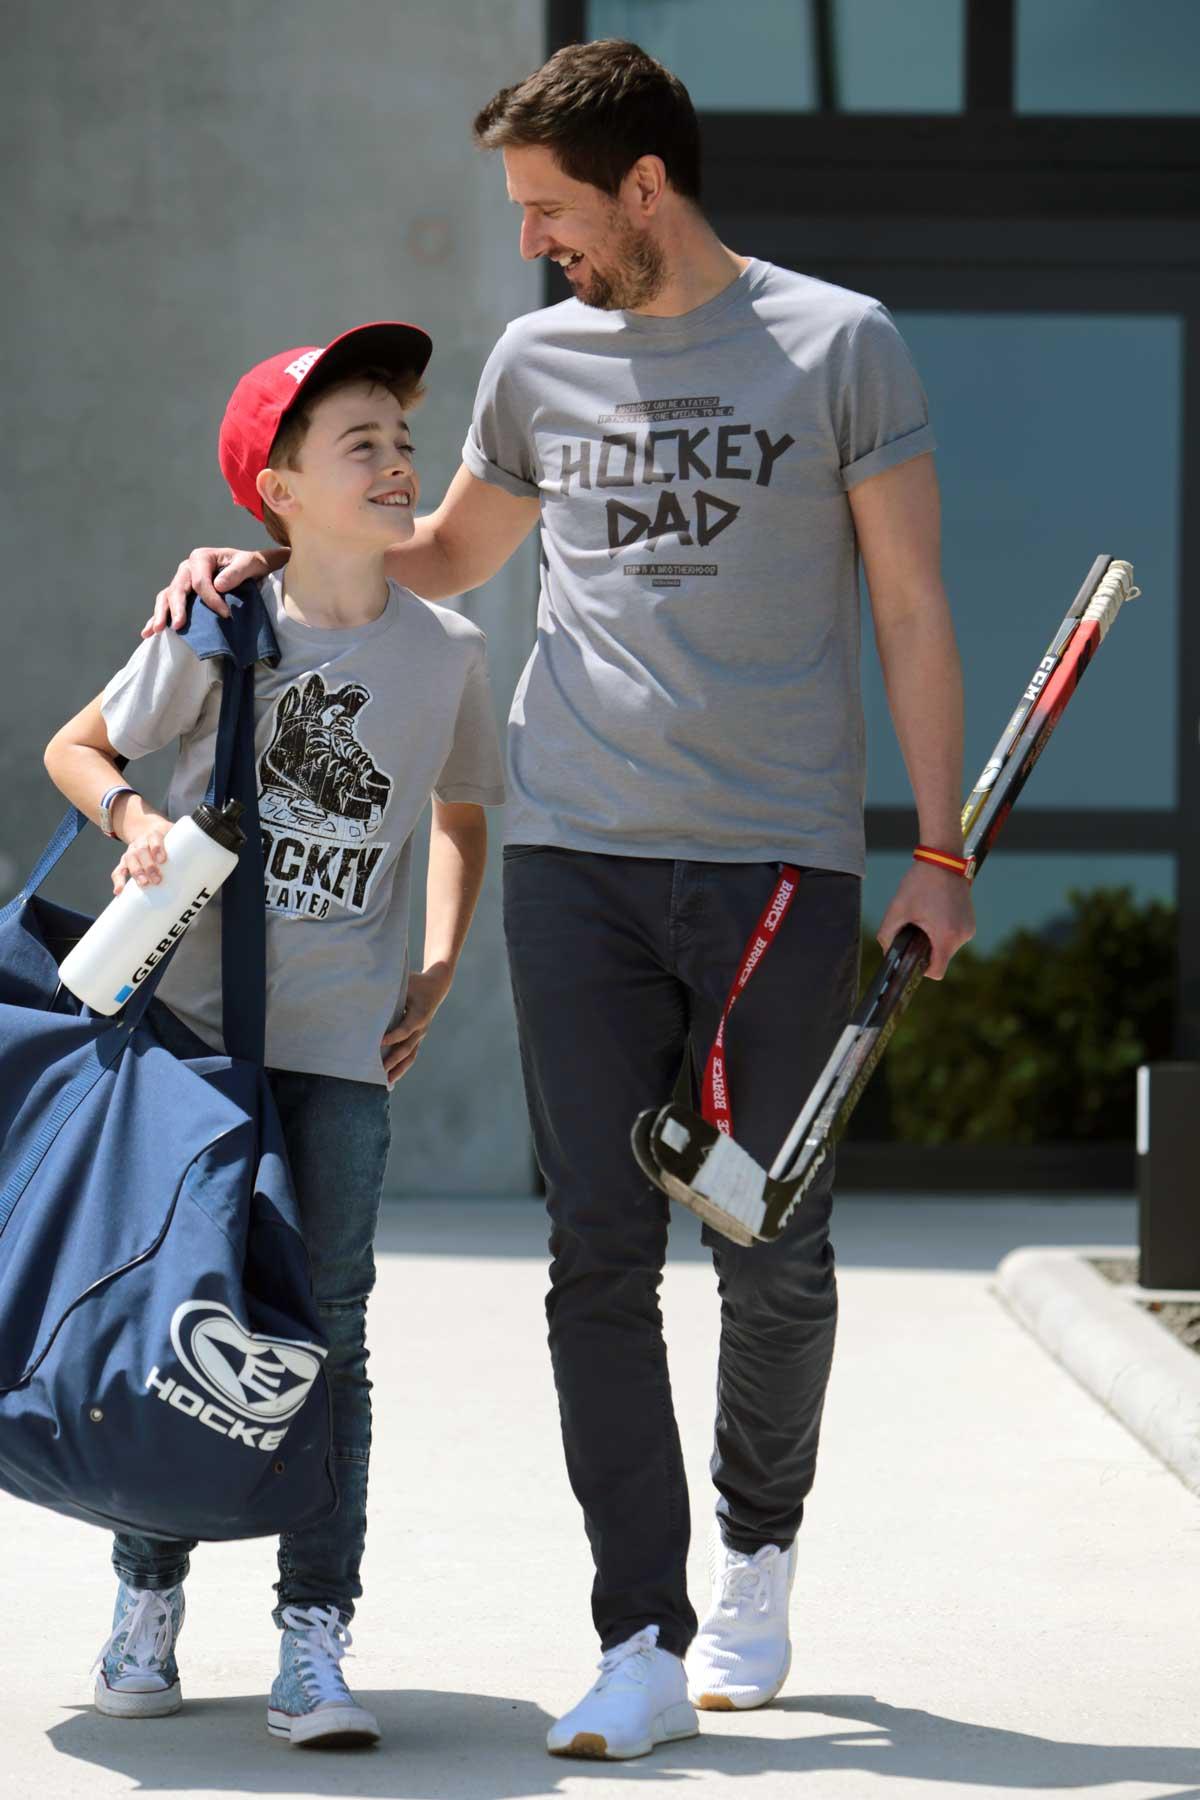 Hockey Dad mit SCALLYEWAG® HOCKEY T-Shirt HOCKEY DAD TAPE und Hockey Kid mit SCALLYWAG® HOCKEY T-Shirt Kids HOCKEY PLAYER und Eishockey Equipment